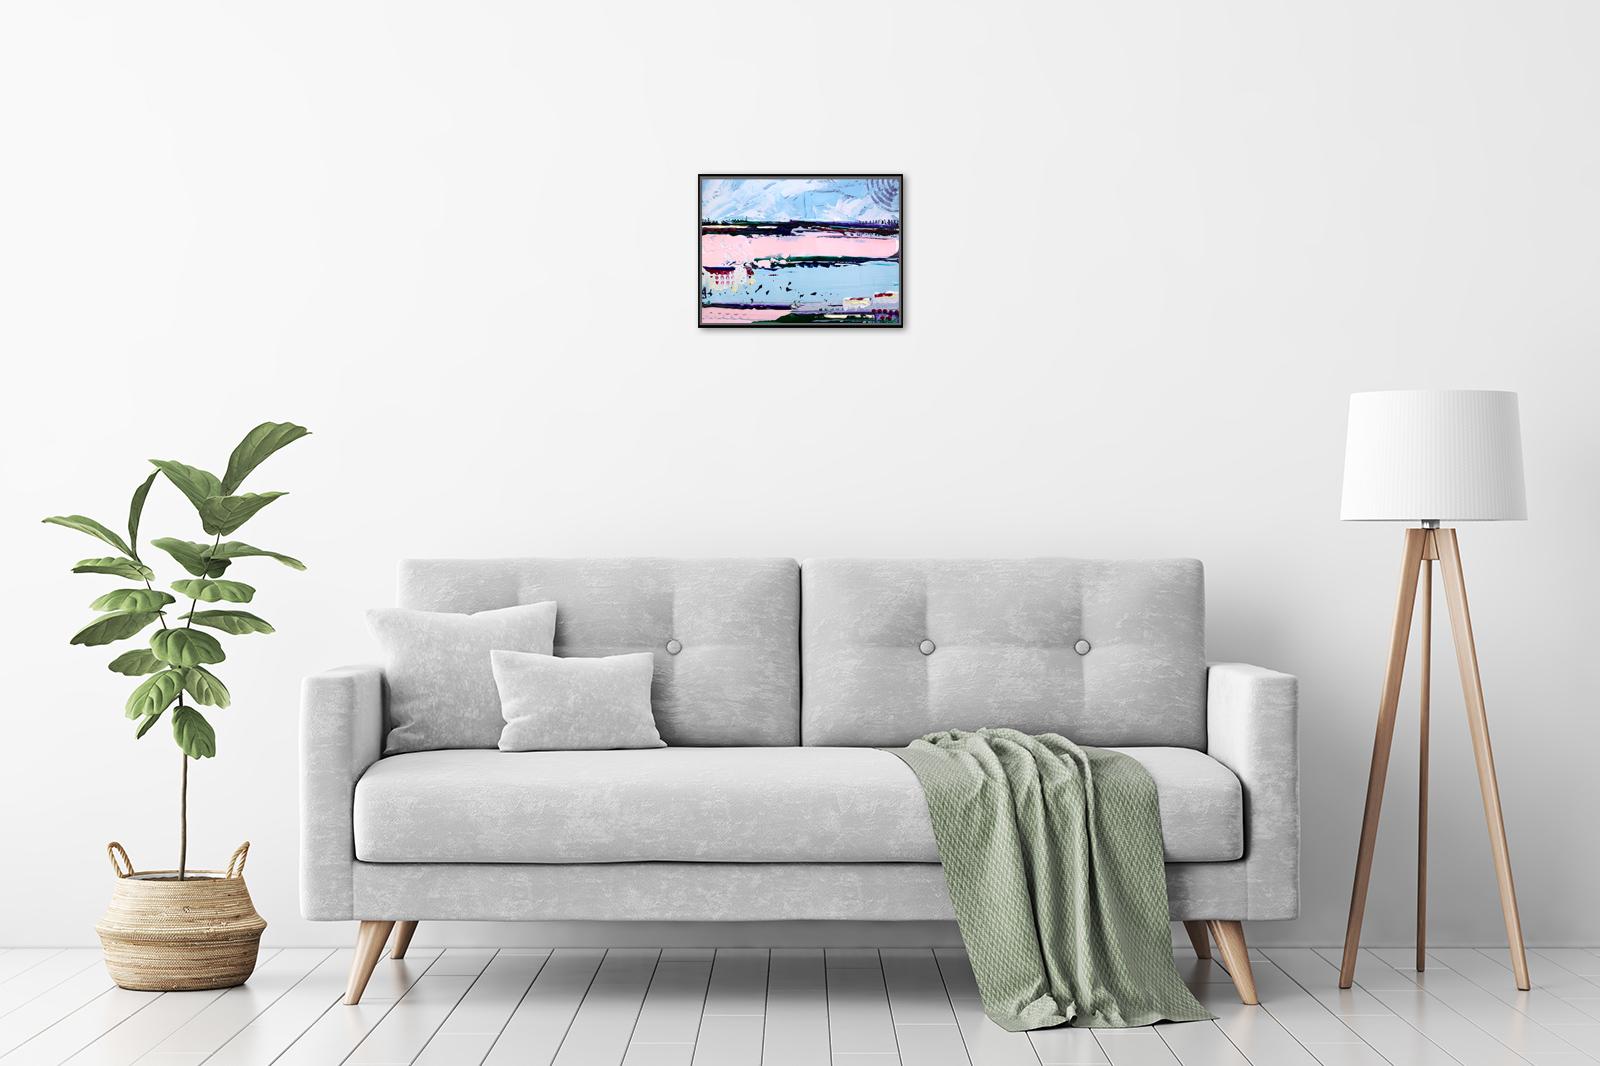 Hilly Coufreur - 'Ocean Breeze II' in a room